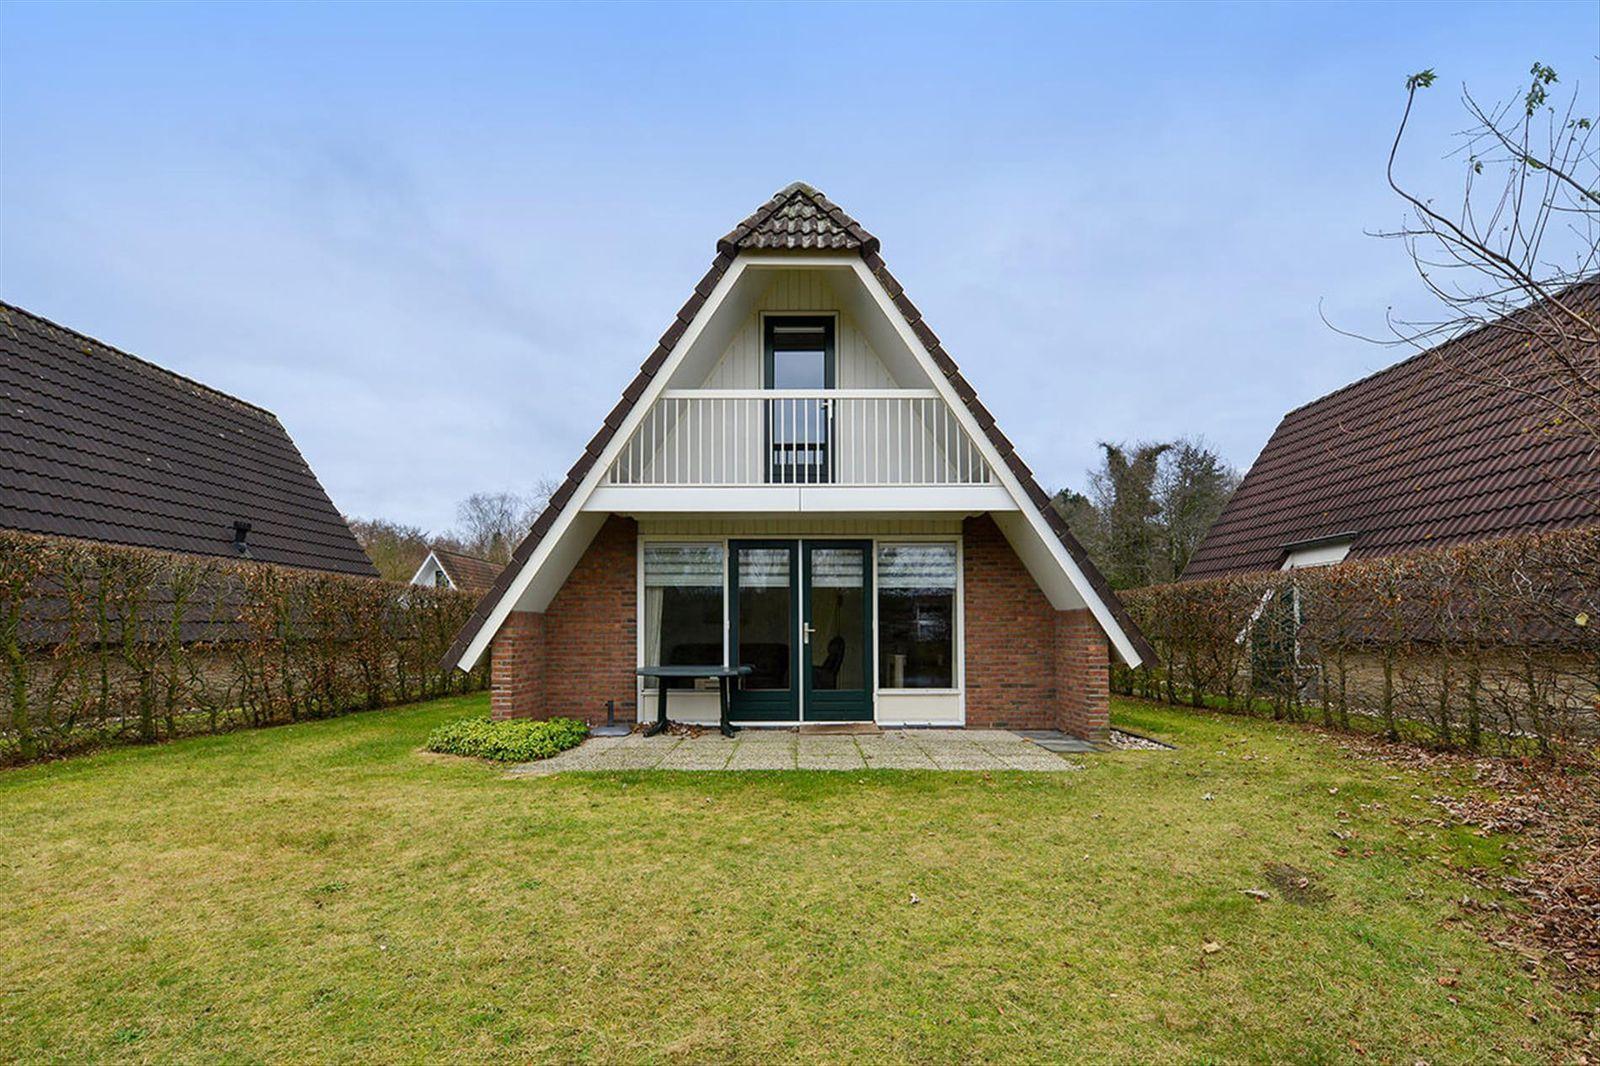 Laan van Westerwolde 15H46, Vlagtwedde